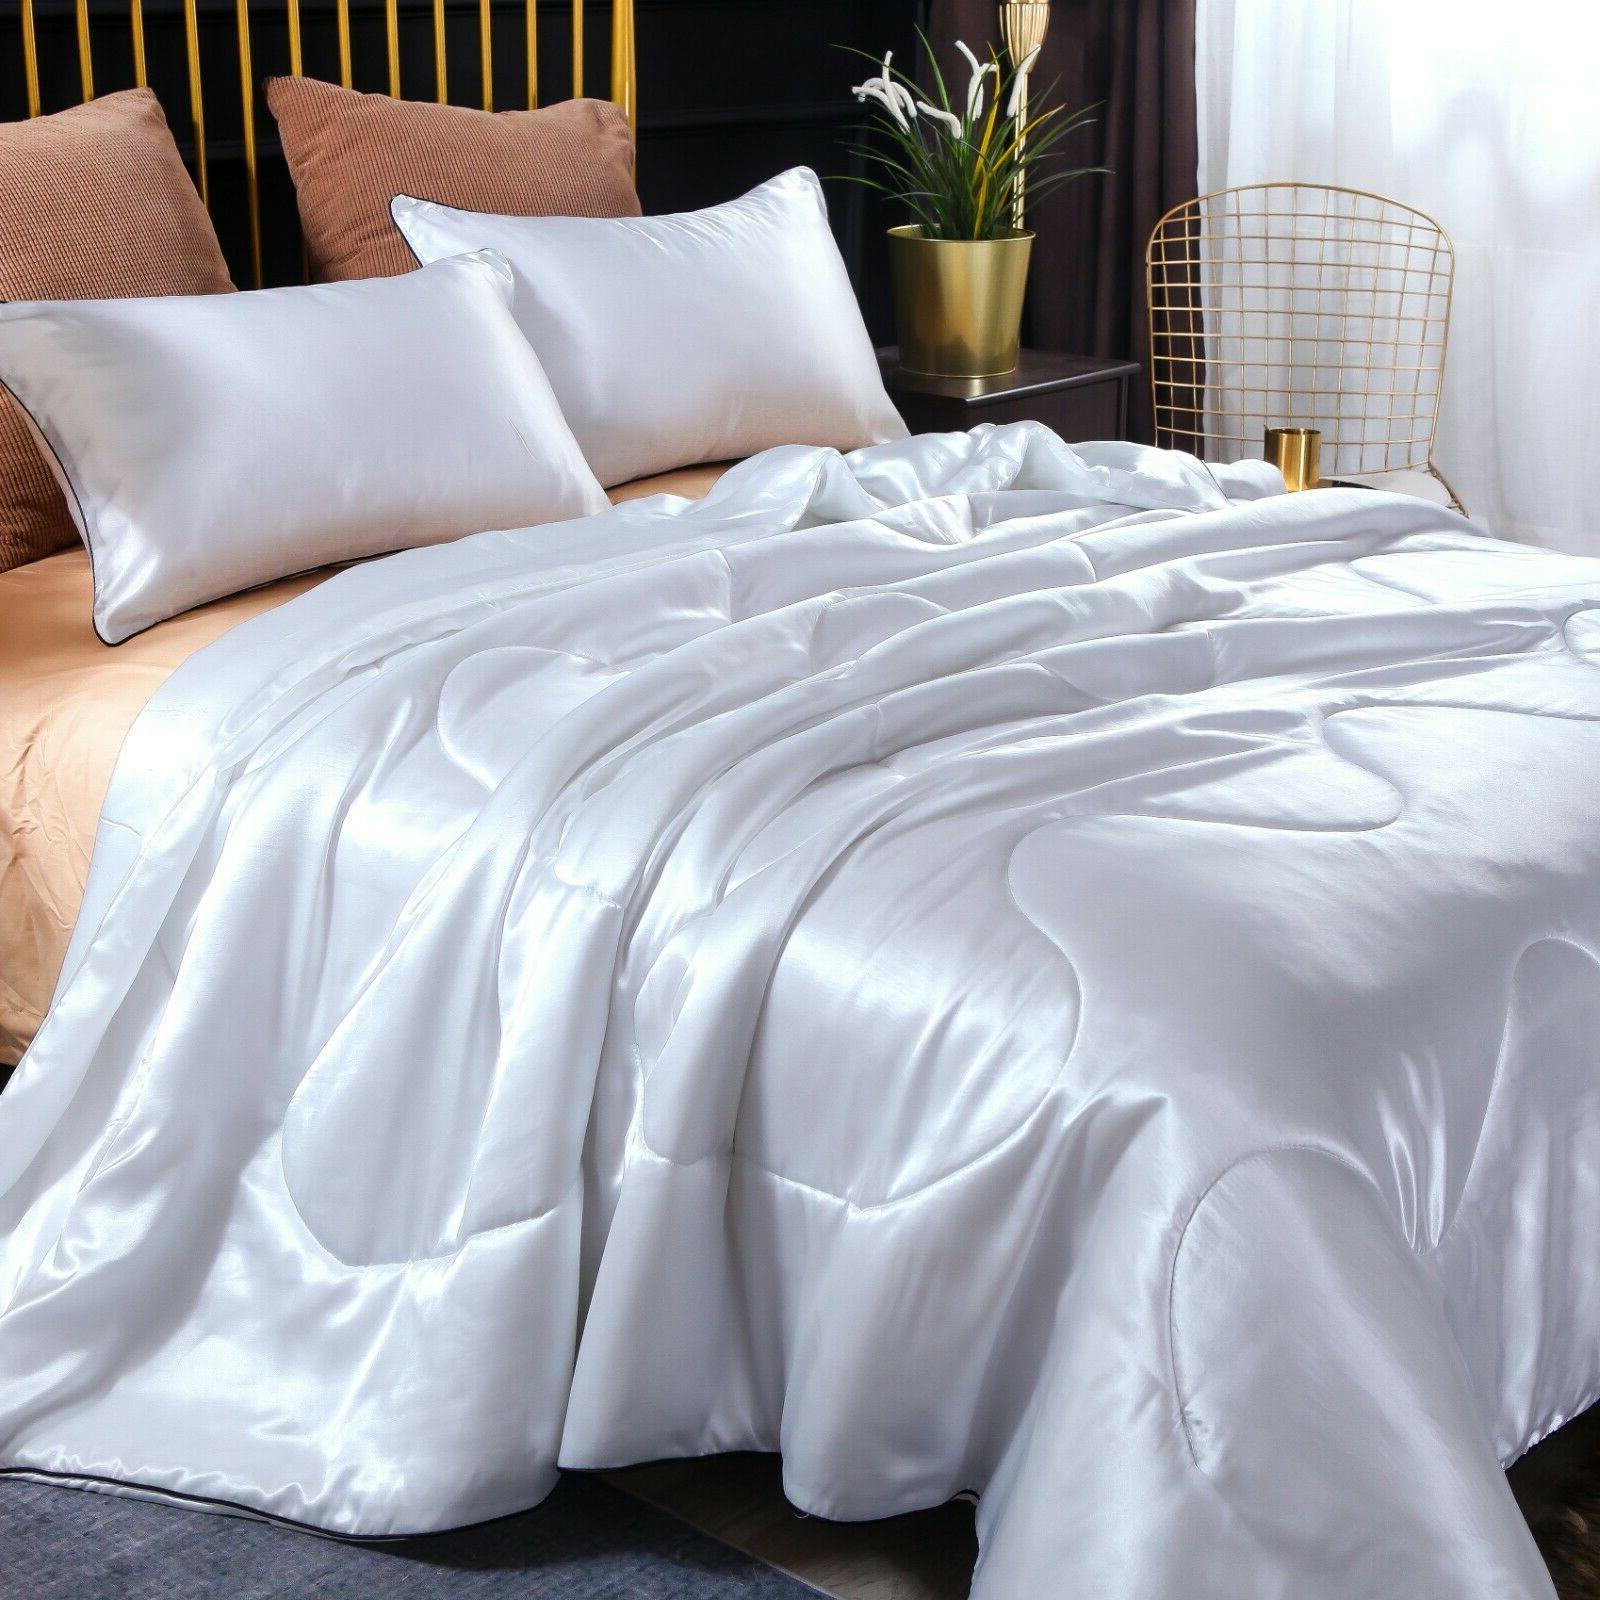 Solid Santin Silk Like Quilt Comforter Soft